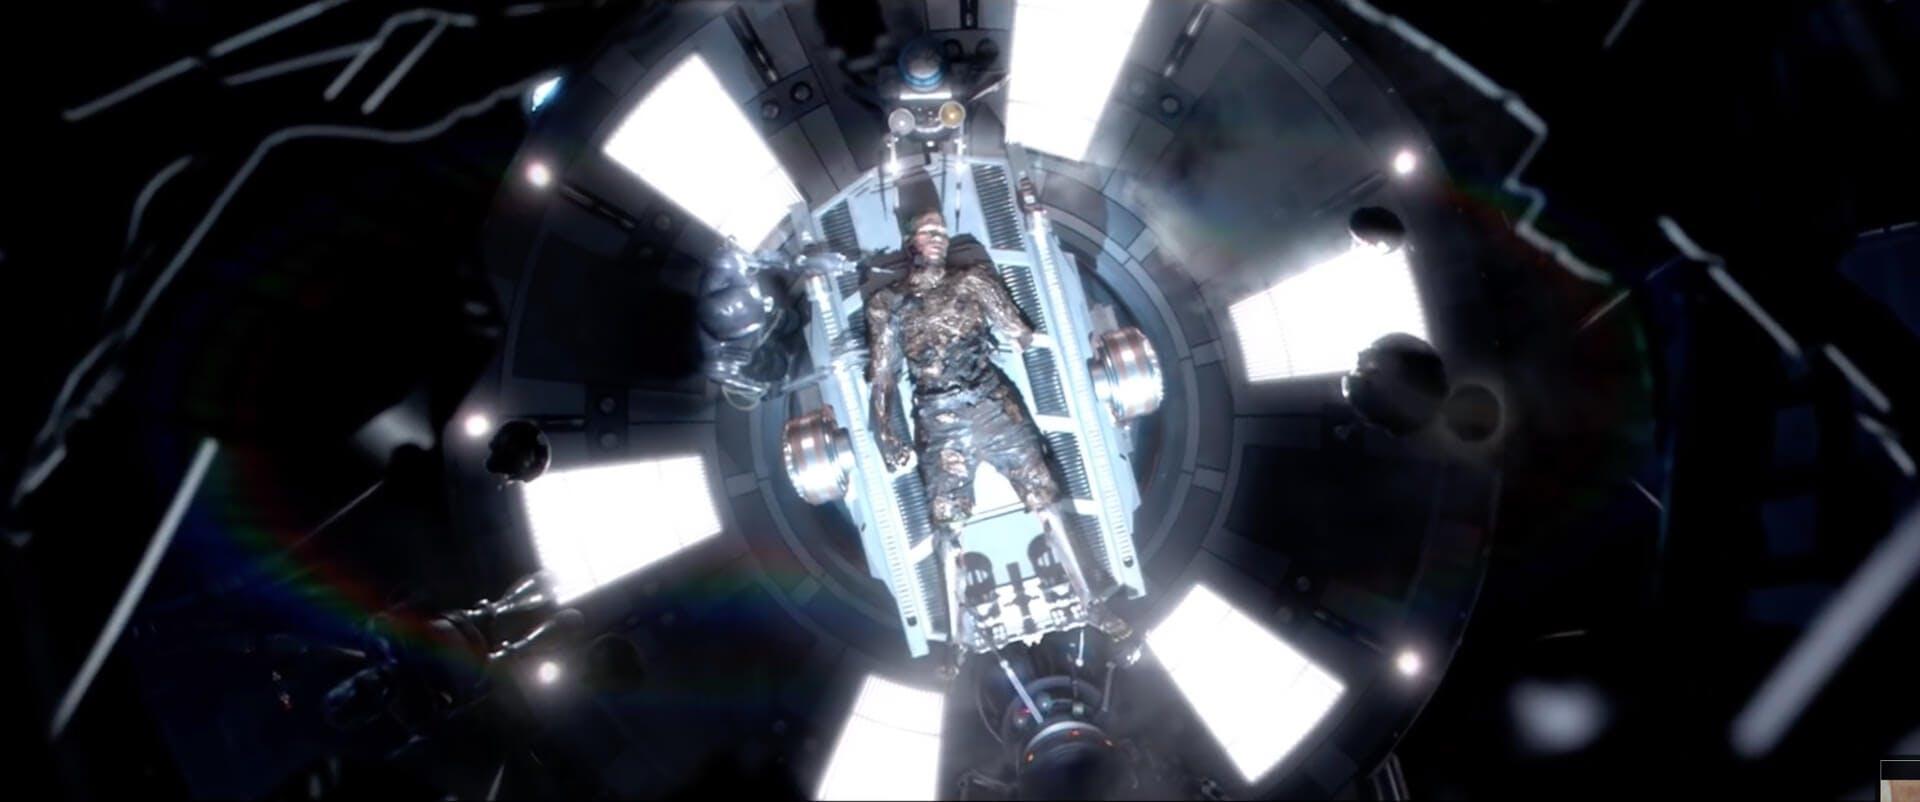 Revenge of the Sith - Anakin Skywalker star wars movies